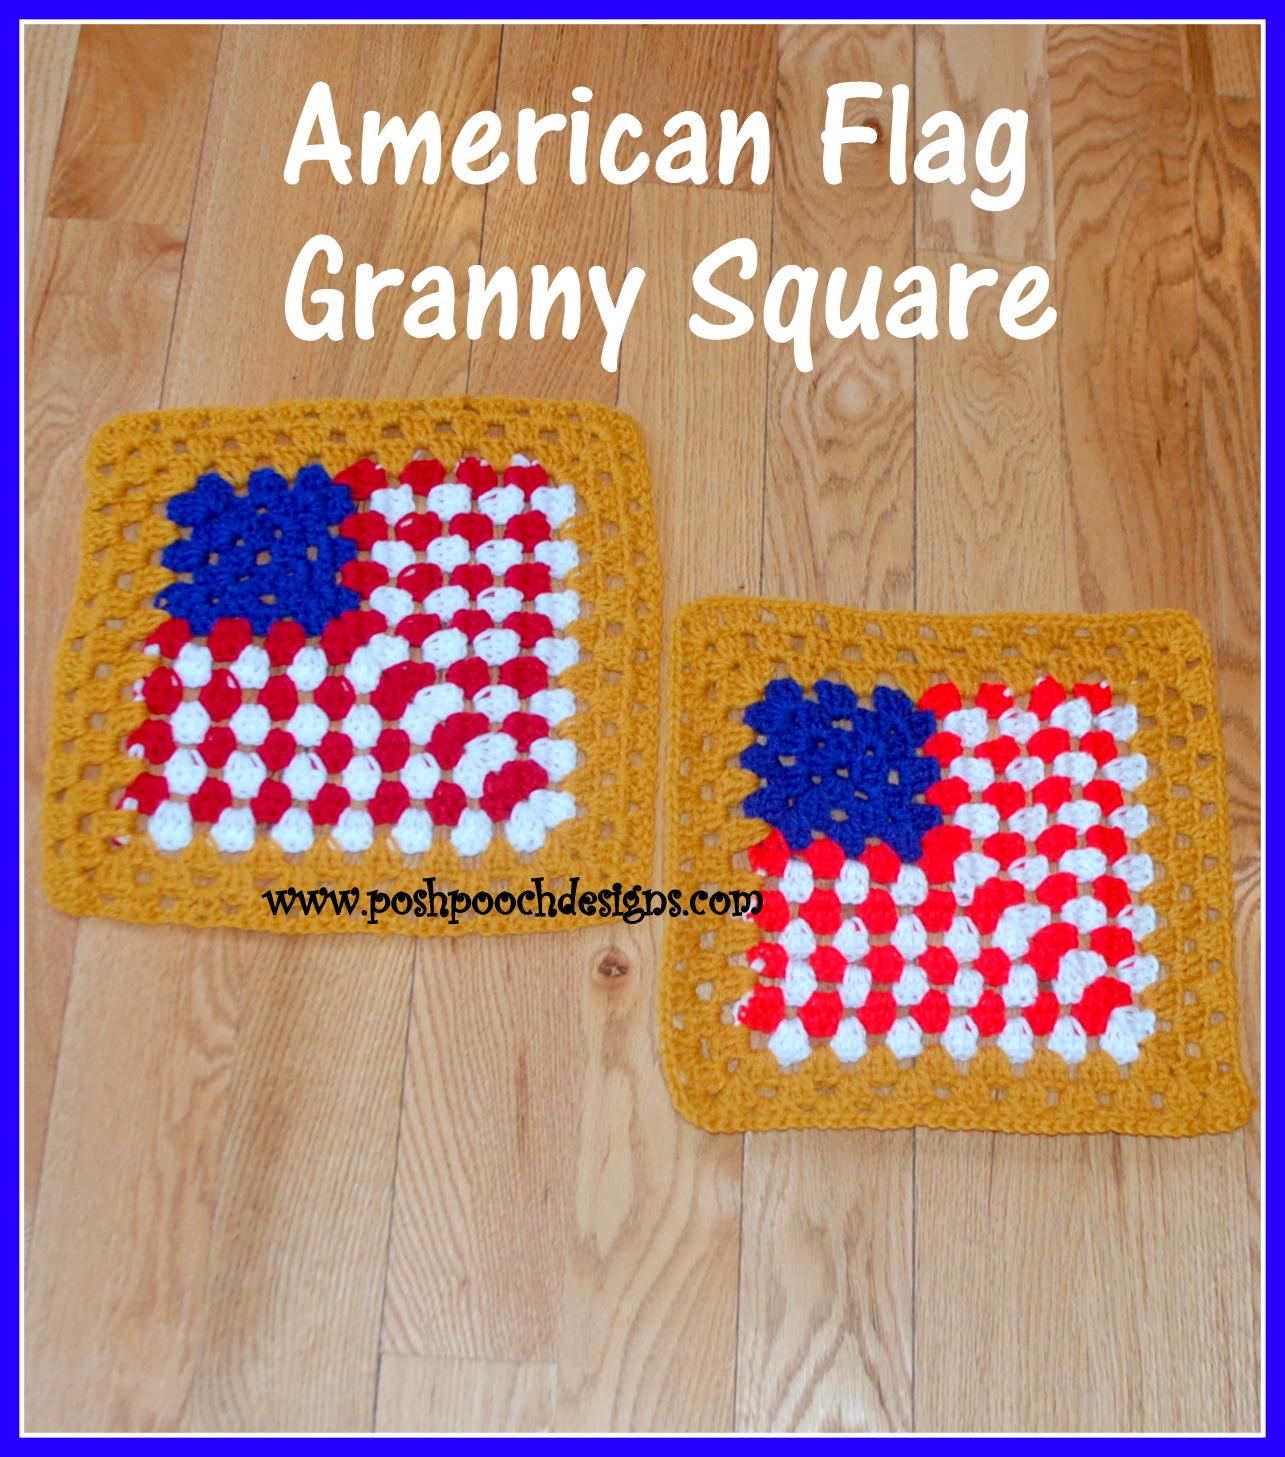 Posh Pooch Designs Dog Clothes American Flag 12 Inch Granny Square